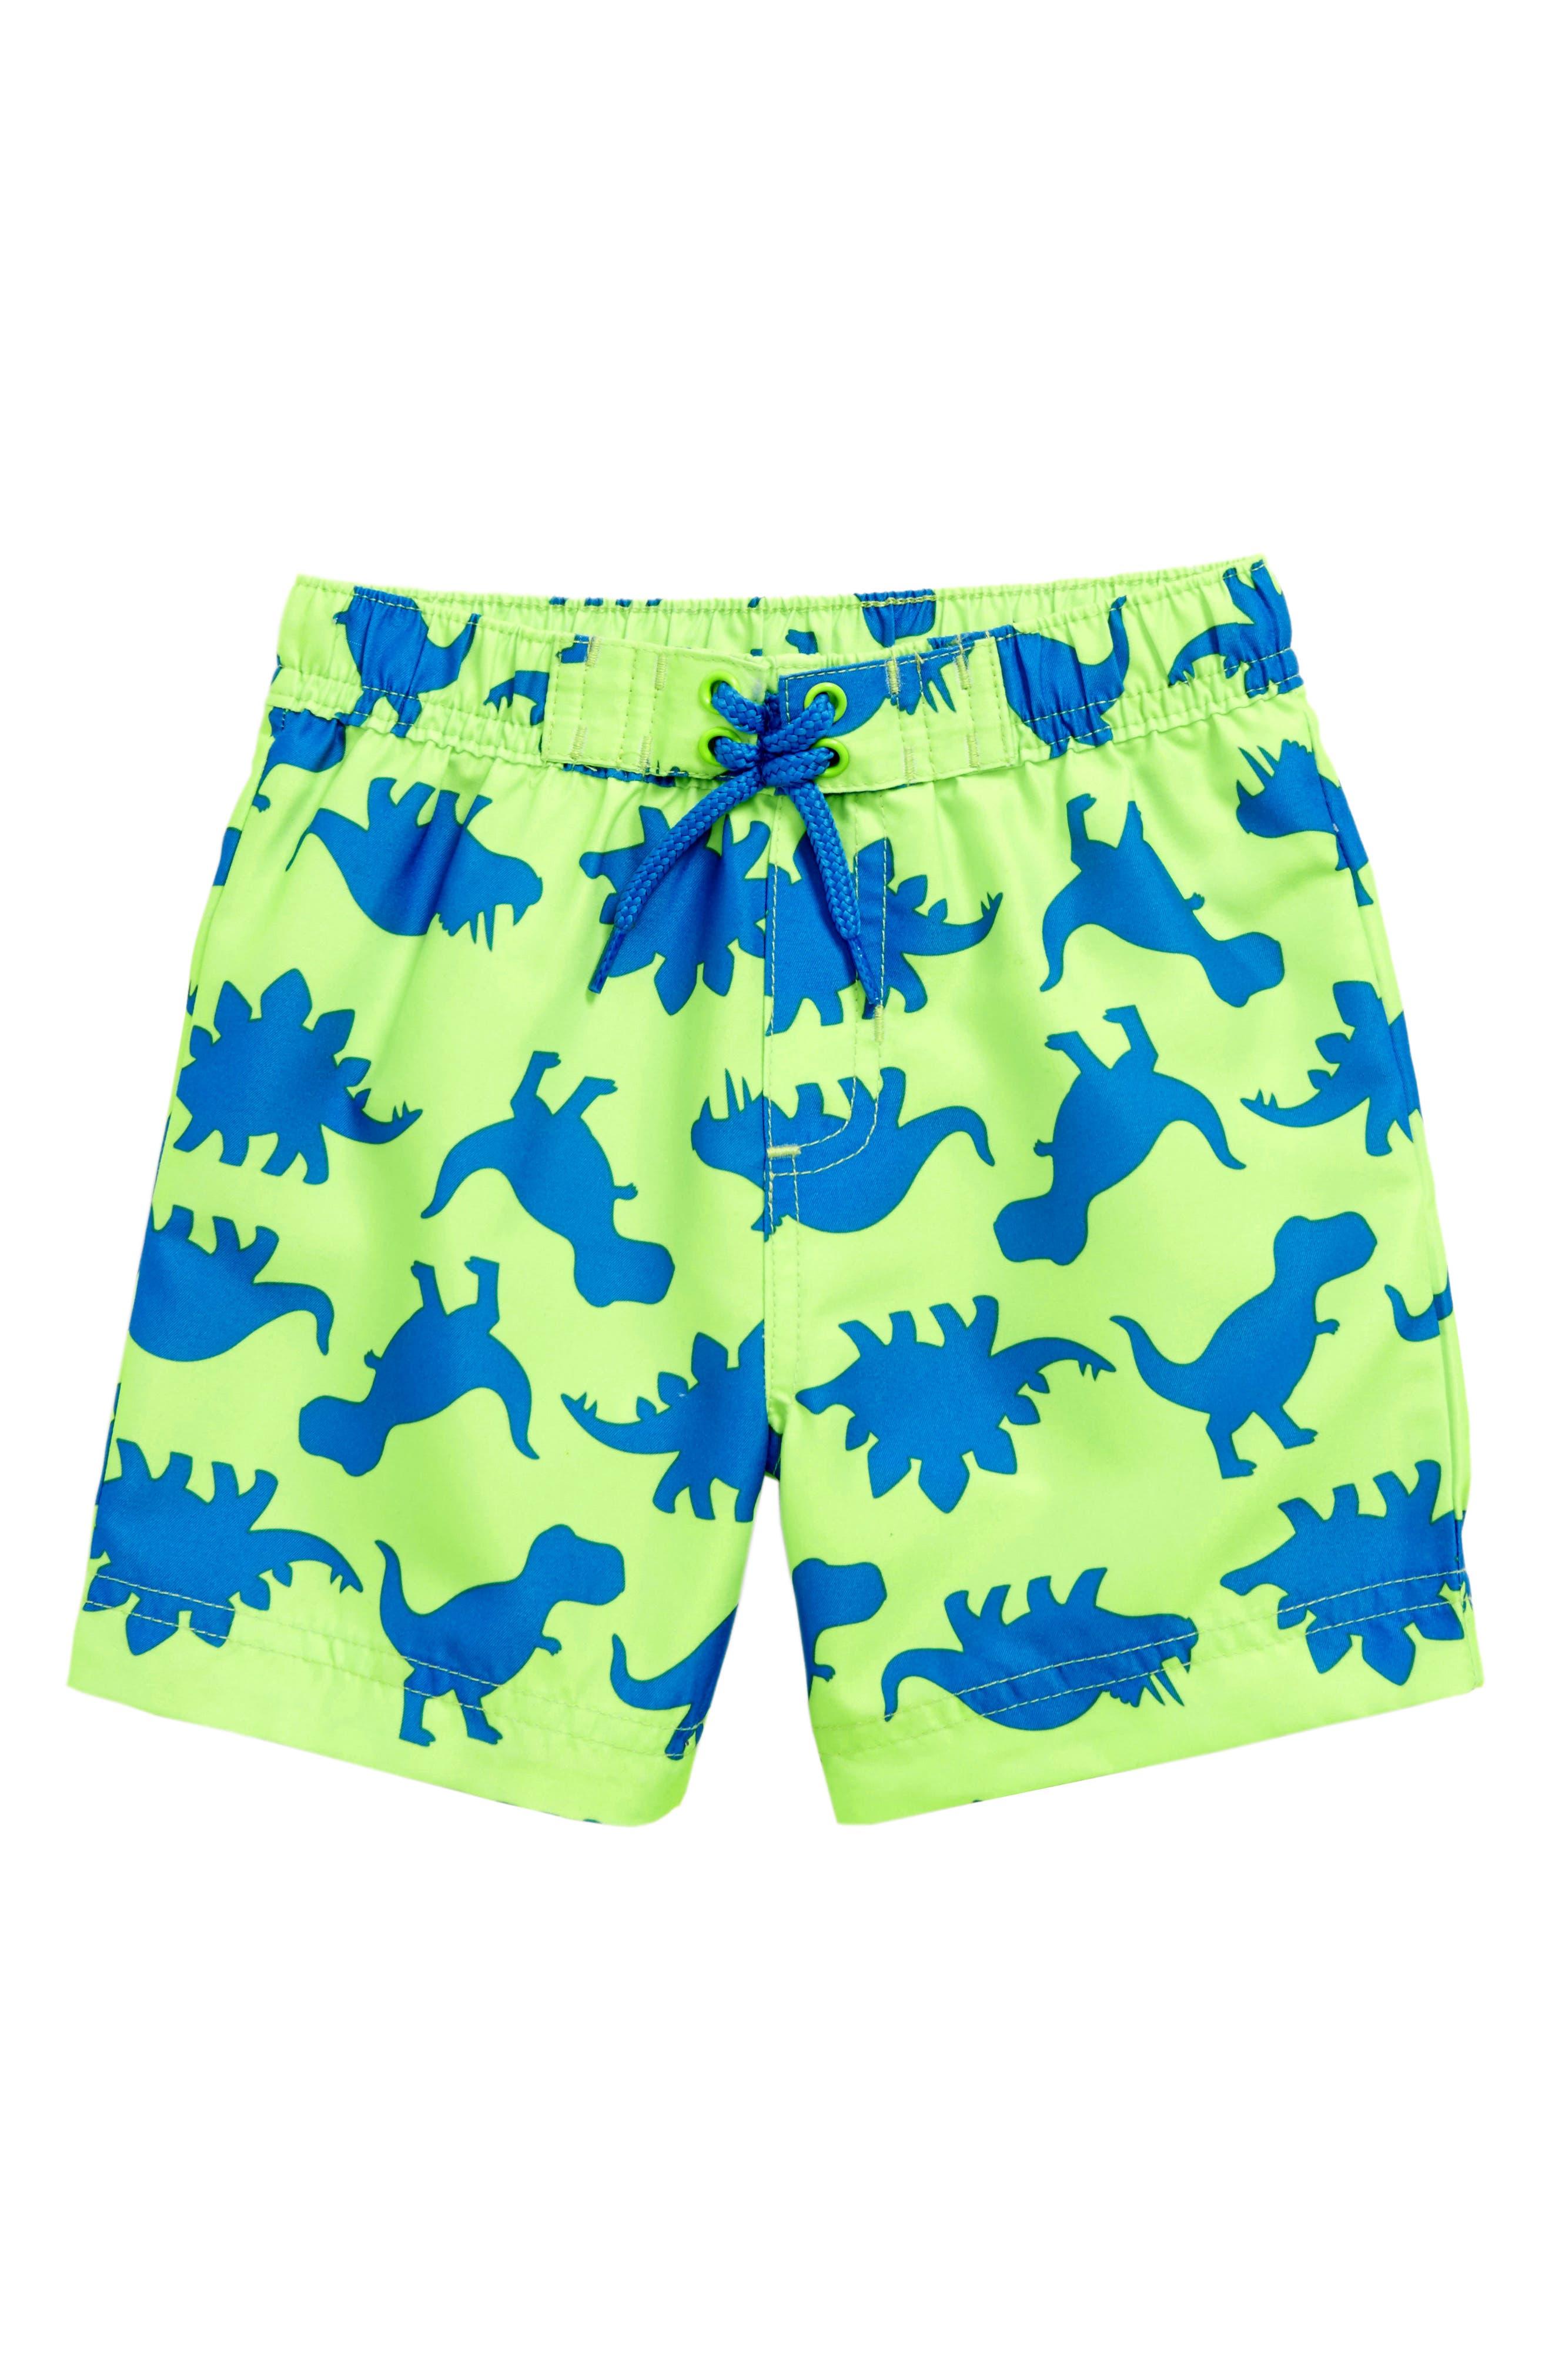 Main Image - Little Me Dino UPF 50+ Swim Trunks (Baby Boys)